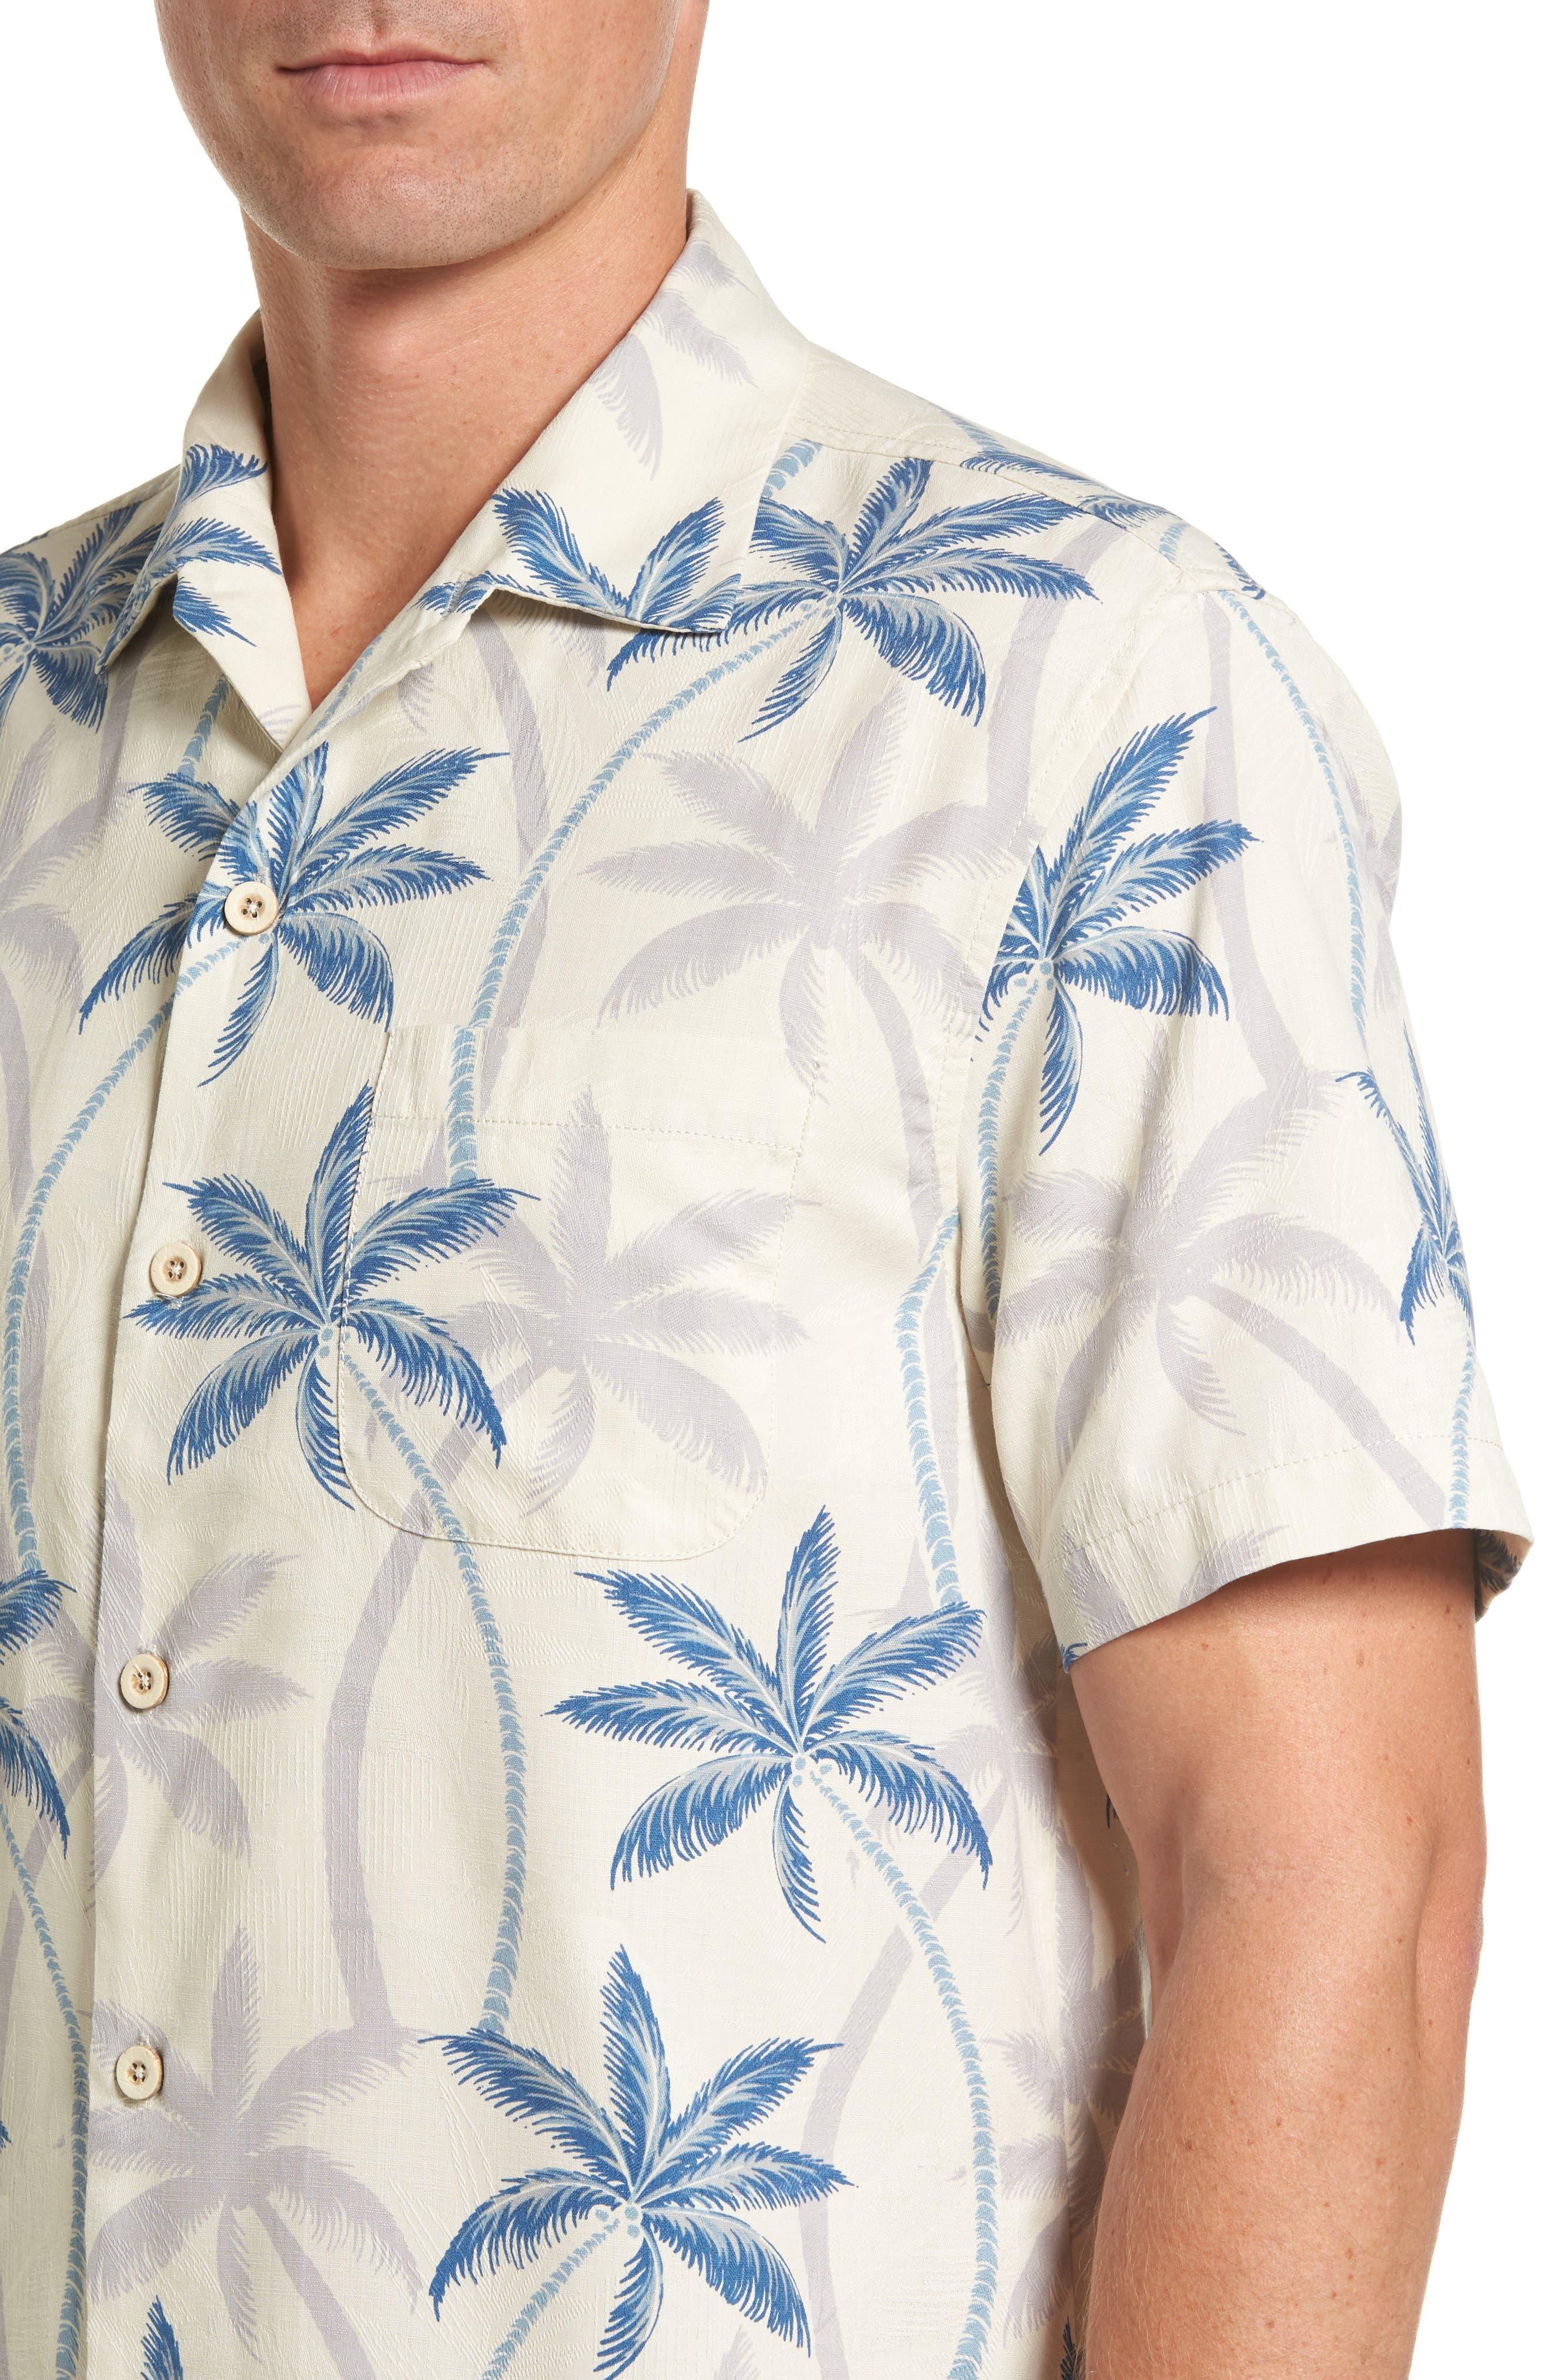 Palmas Palooza Woven Shirt,                             Alternate thumbnail 4, color,                             100